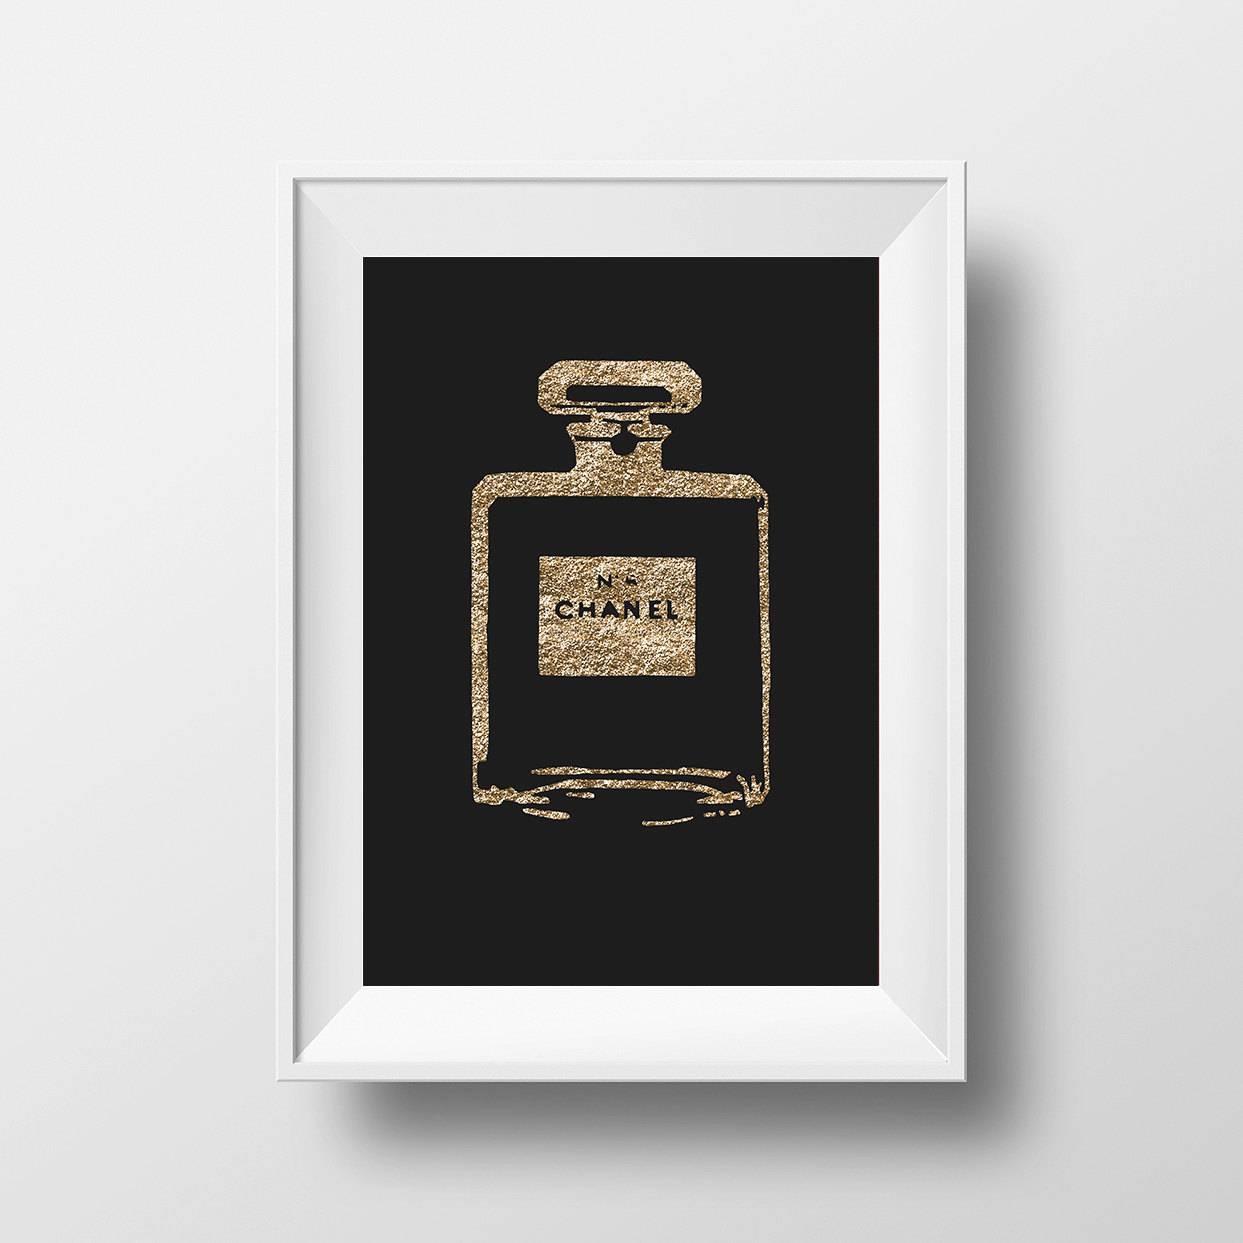 Charming Chanel Perfume Wall Art Uk Chanel Wall Art A Coco Chanel Within 2017 Chanel Wall Decor (View 9 of 25)